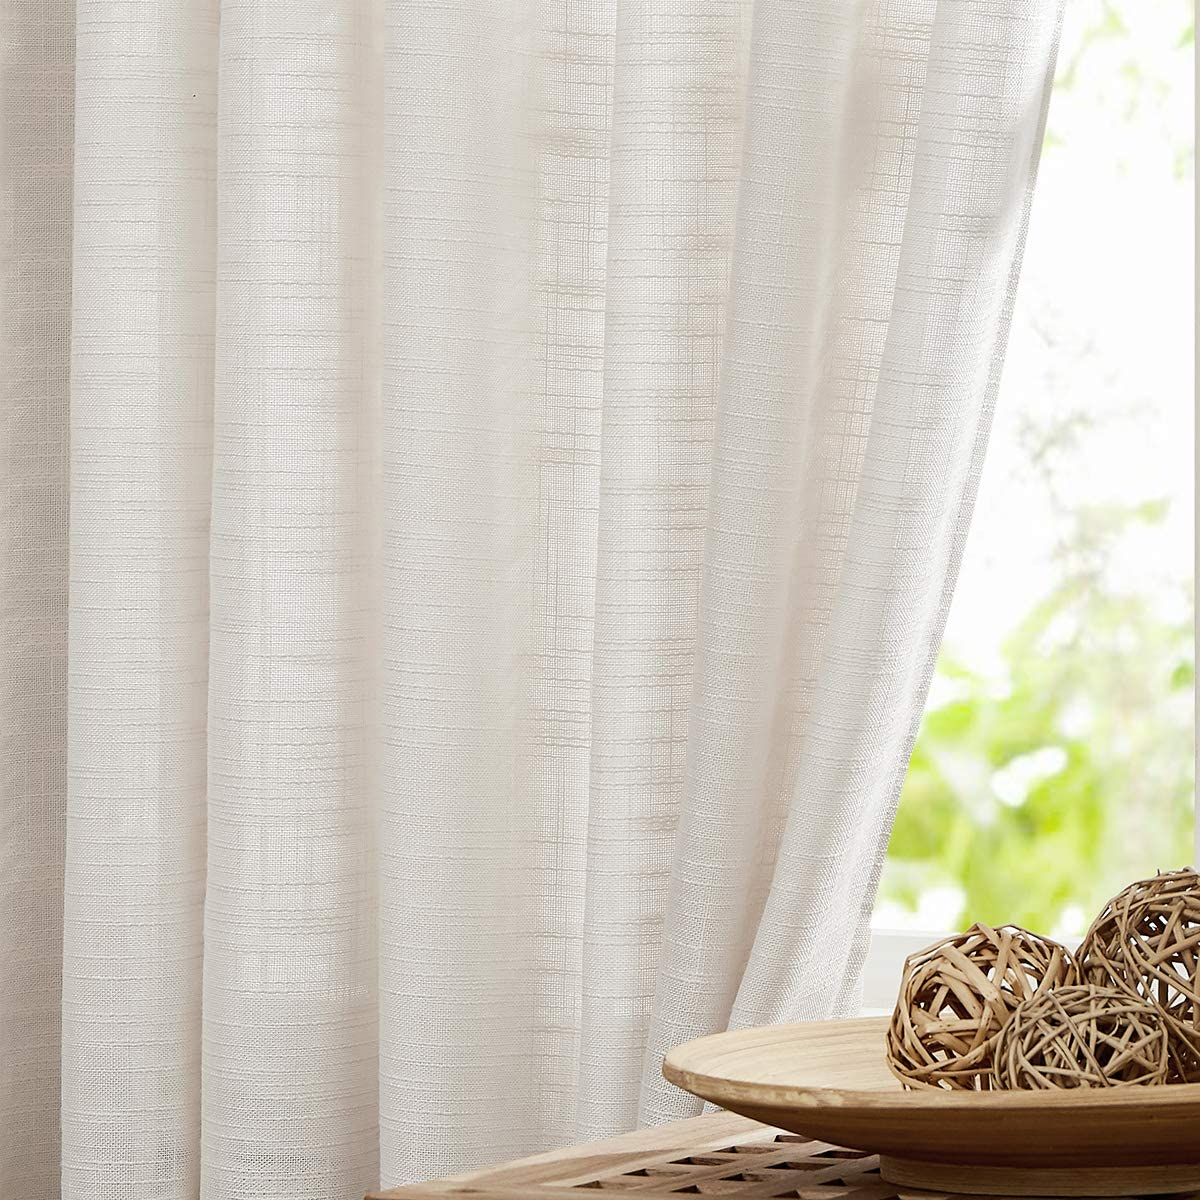 Natural Semi-Sheer Linen Curtains for Rich Room Cross Wea Living Ranking Virginia Beach Mall TOP4